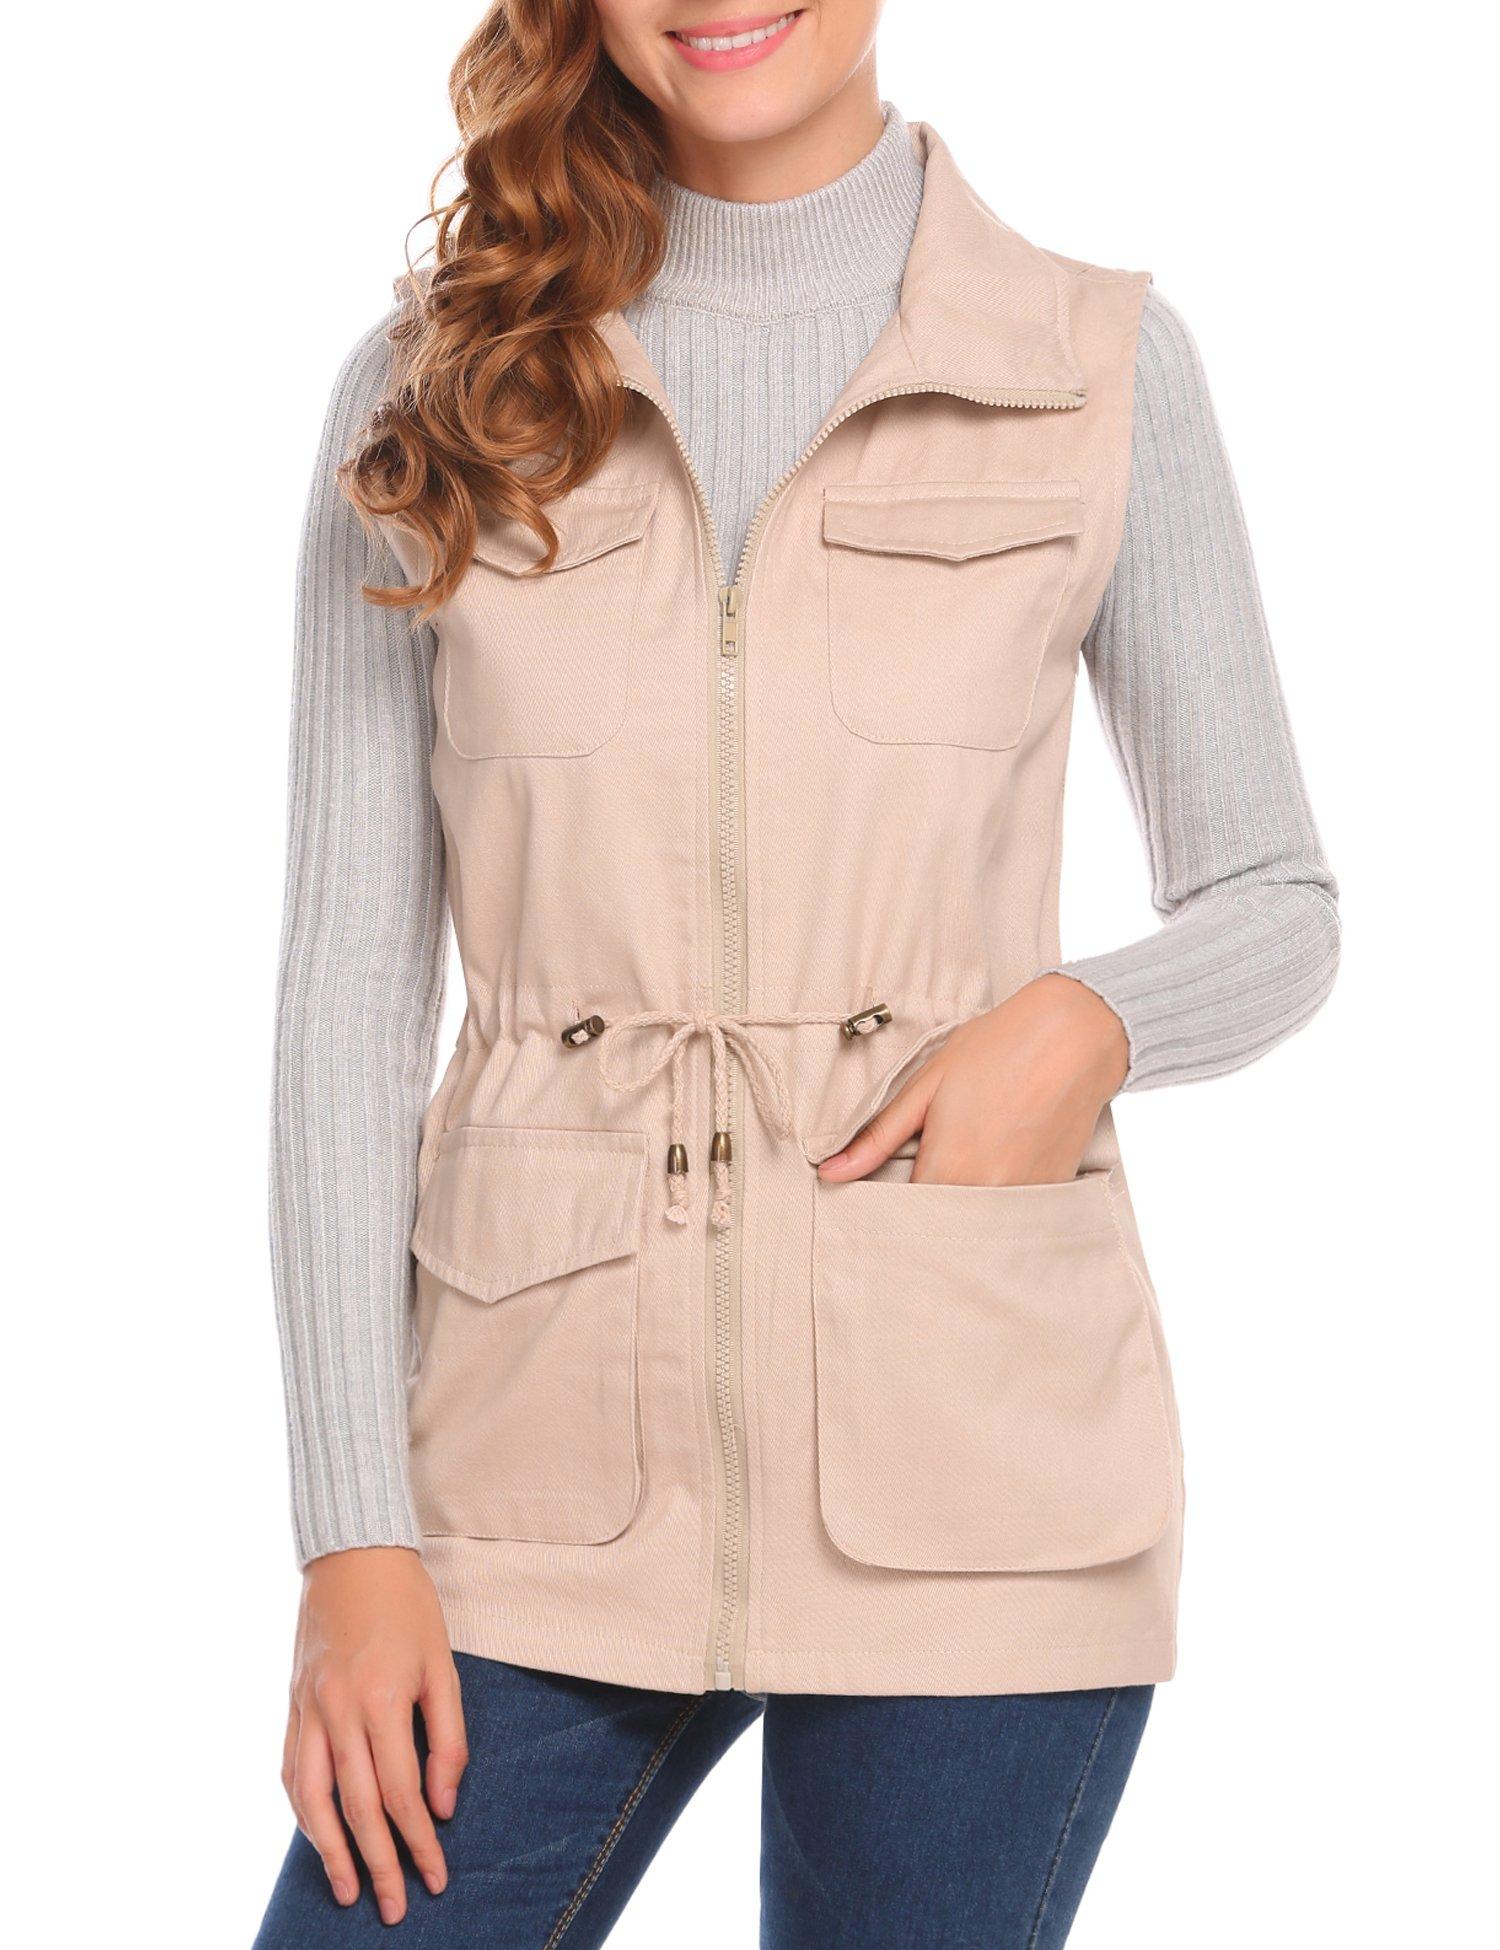 UNibelle Womens Sleeveless Lightweight Military Anorak Vest